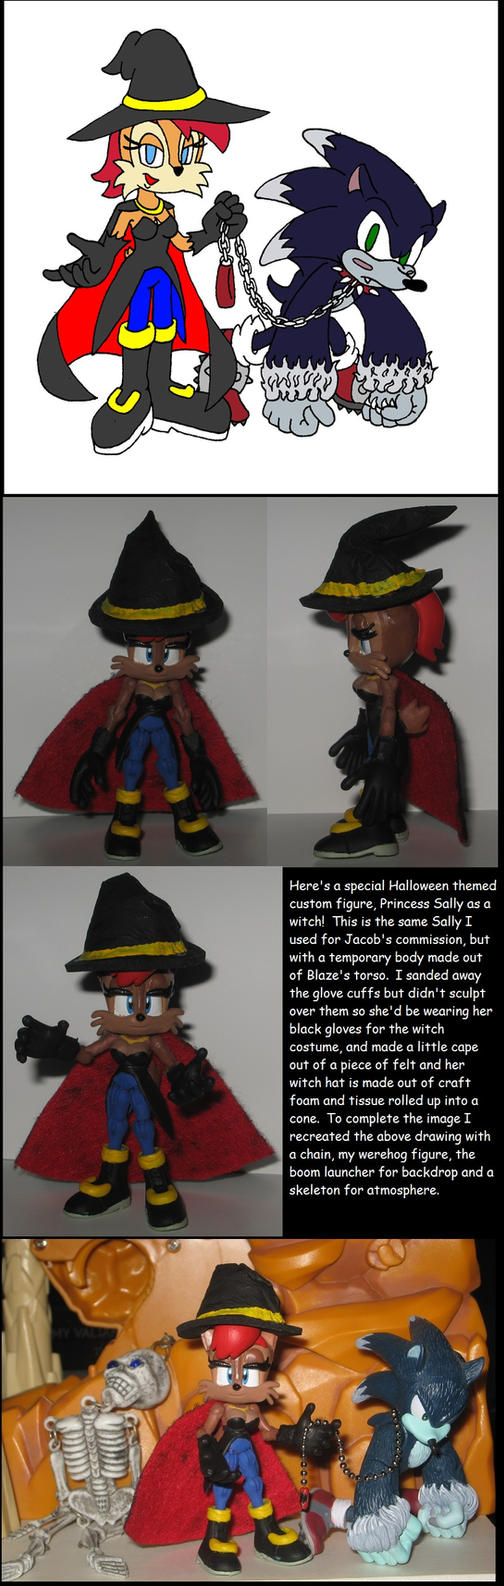 Wakeangel2K1 Halloween: Sally Witch by Wakeangel2001